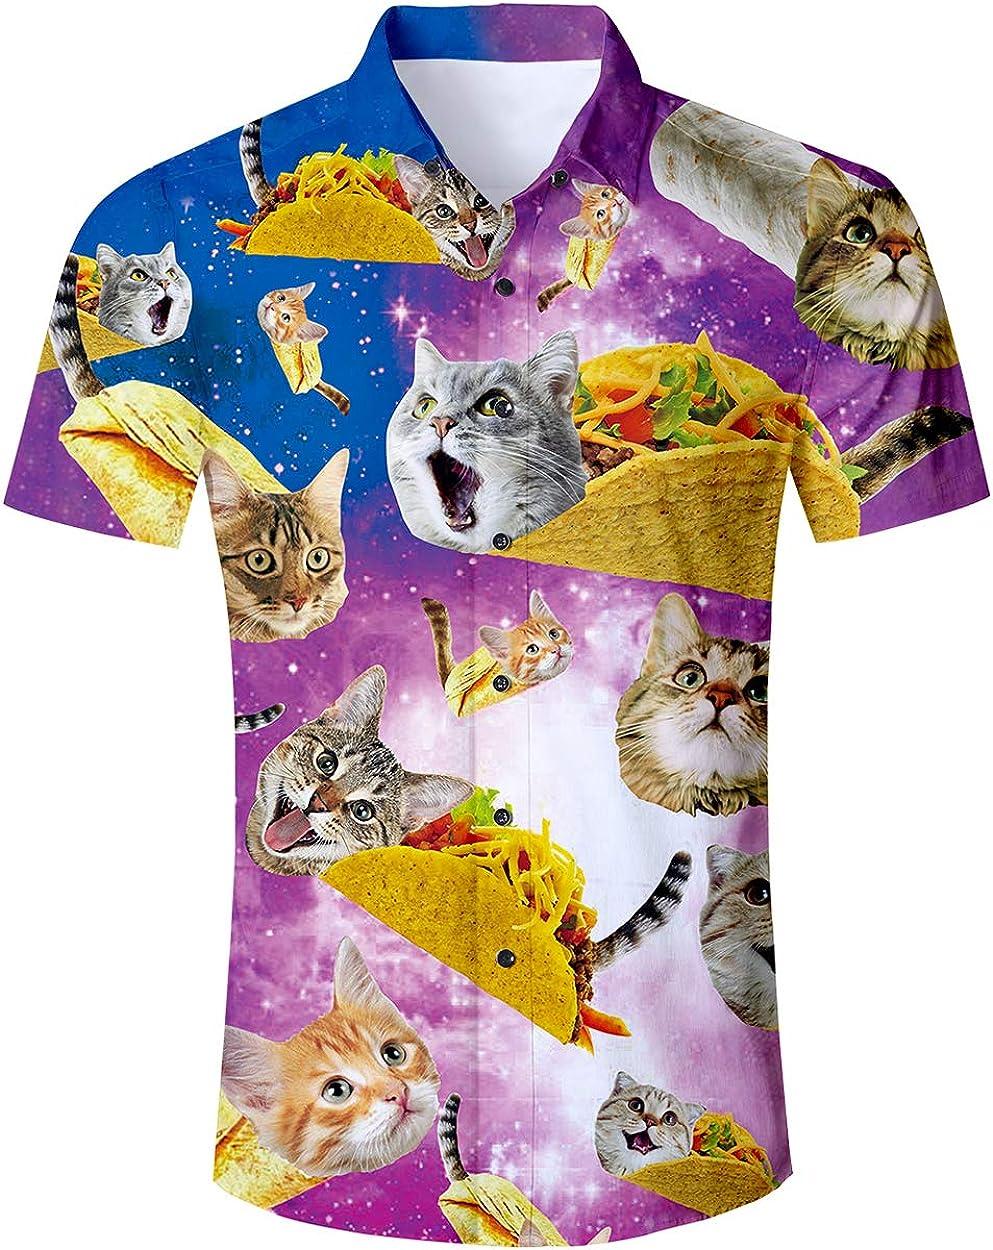 RAISEVERN Mens Button Down Shirts Slim-fit Short Sleeve Dress Shirt Casual Hawaiian Summer Aloha Beach Shirts for Holiday